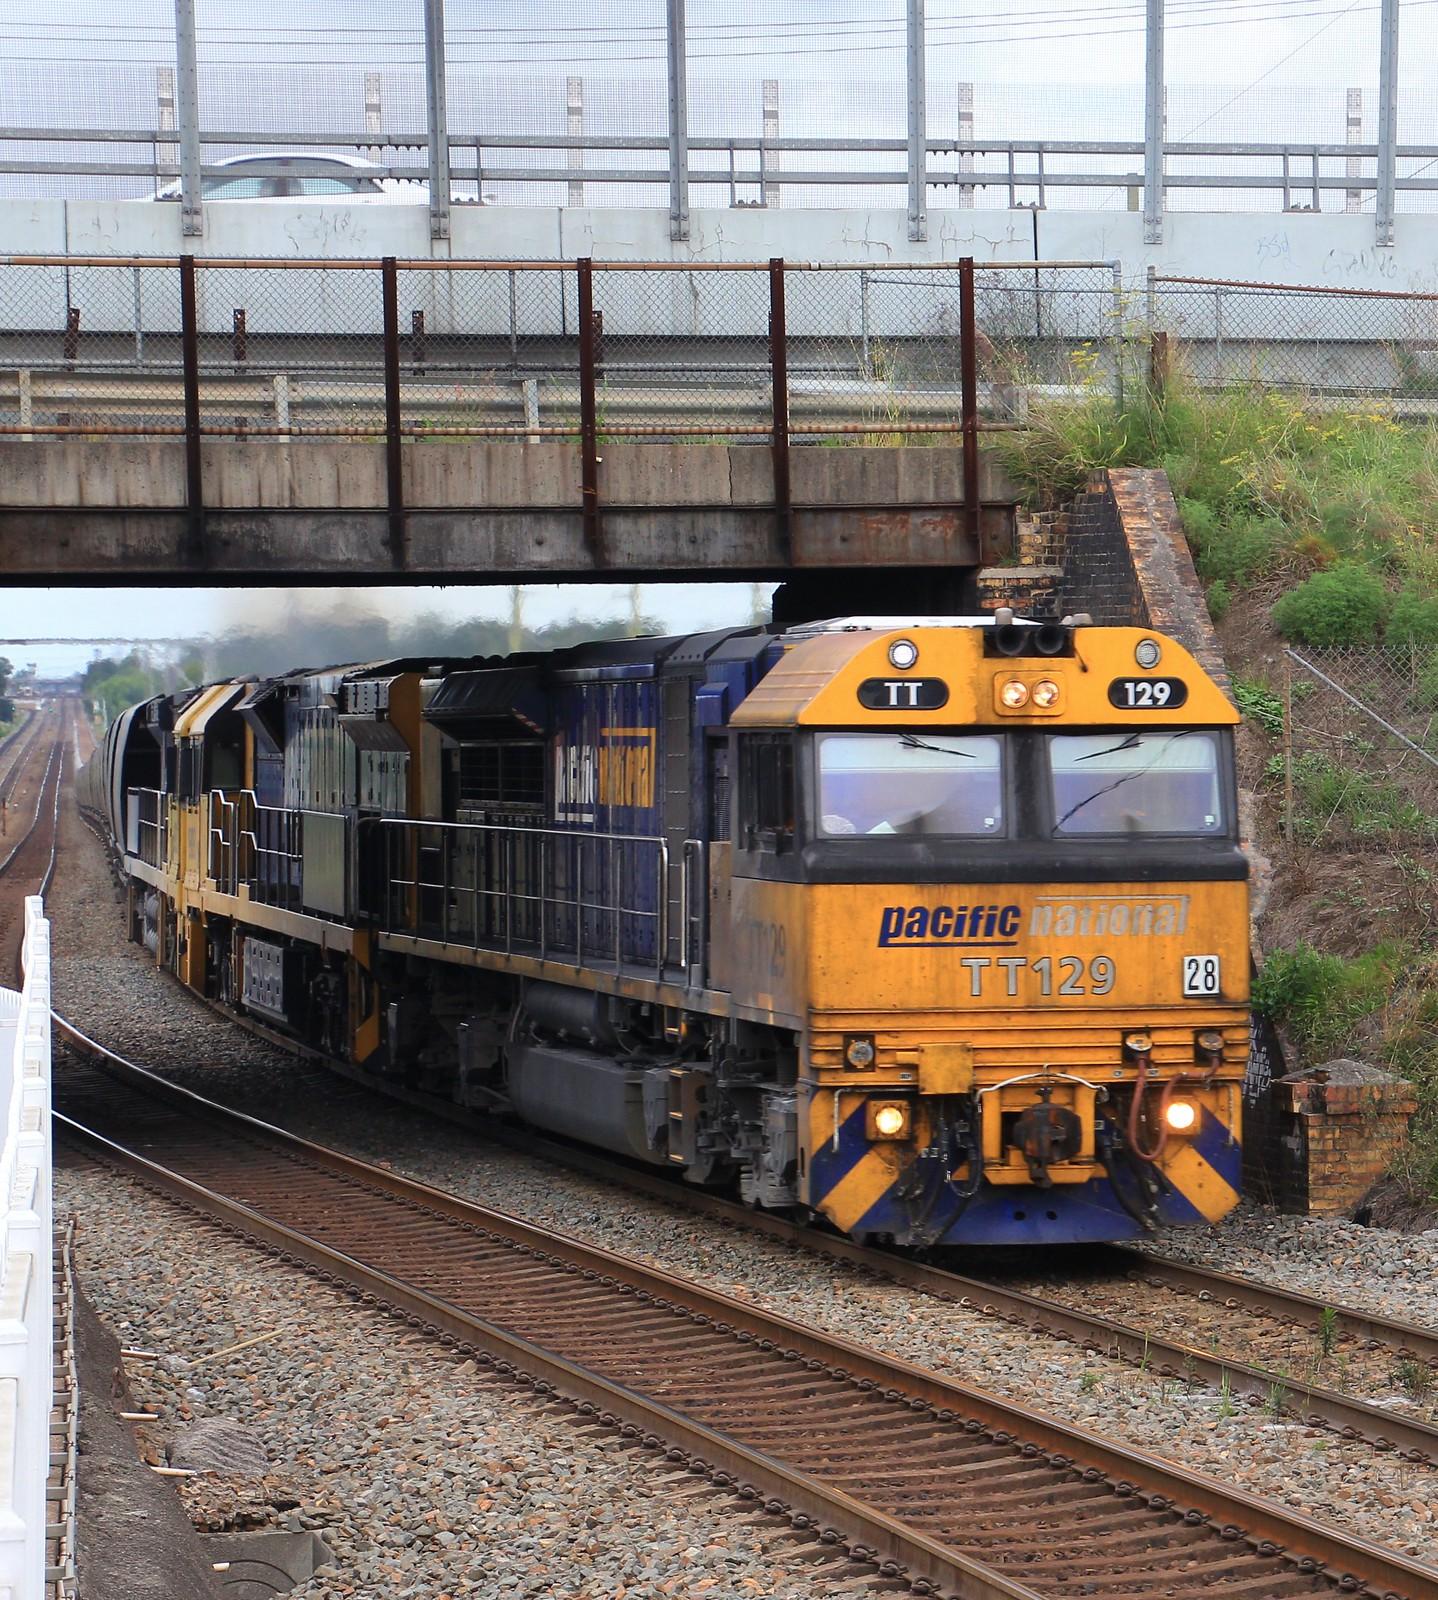 TT129 9303 and 9203 glide through Thornton on NB941G empty PN coal by bukk05